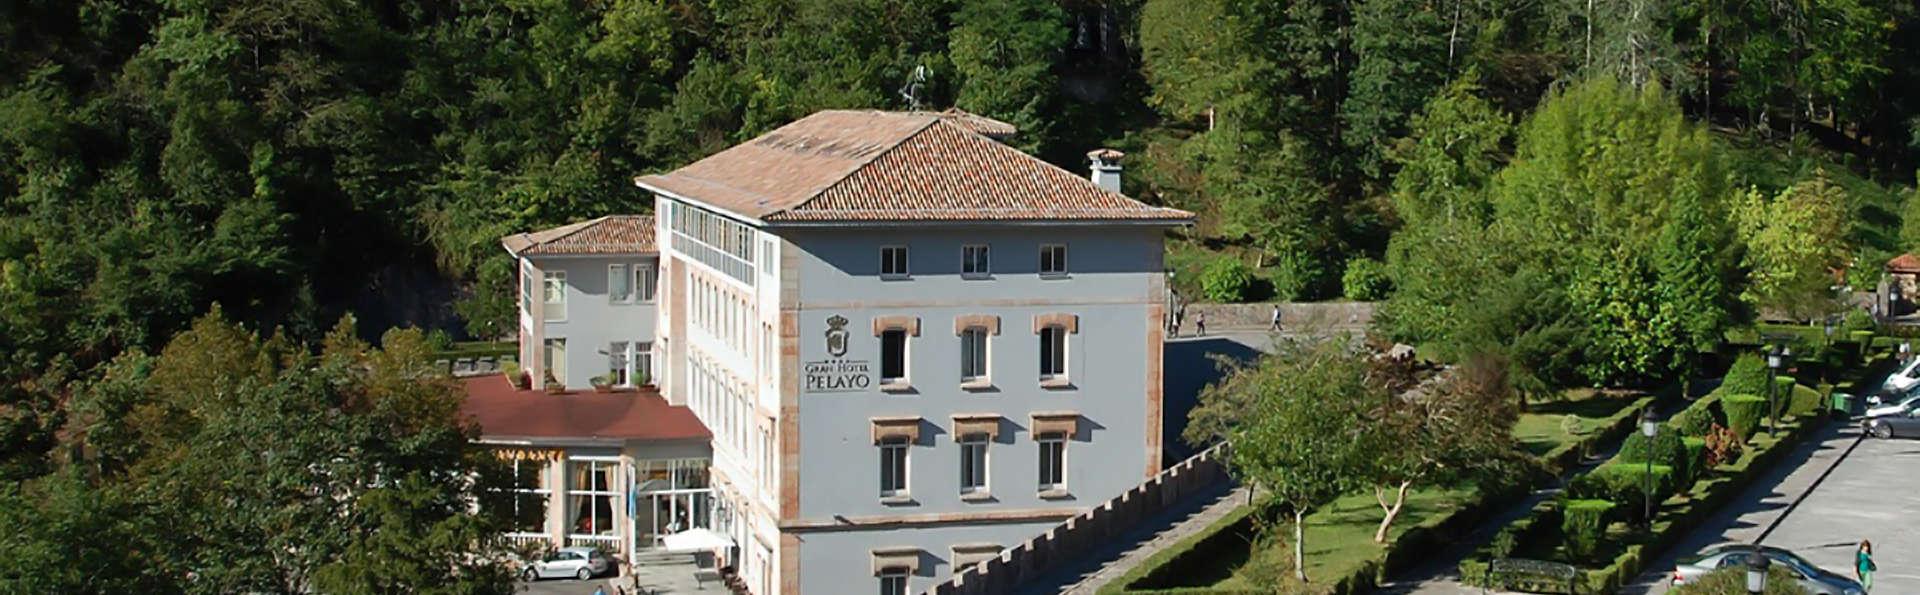 Arcea Gran Hotel Pelayo - Edit_front3.jpg